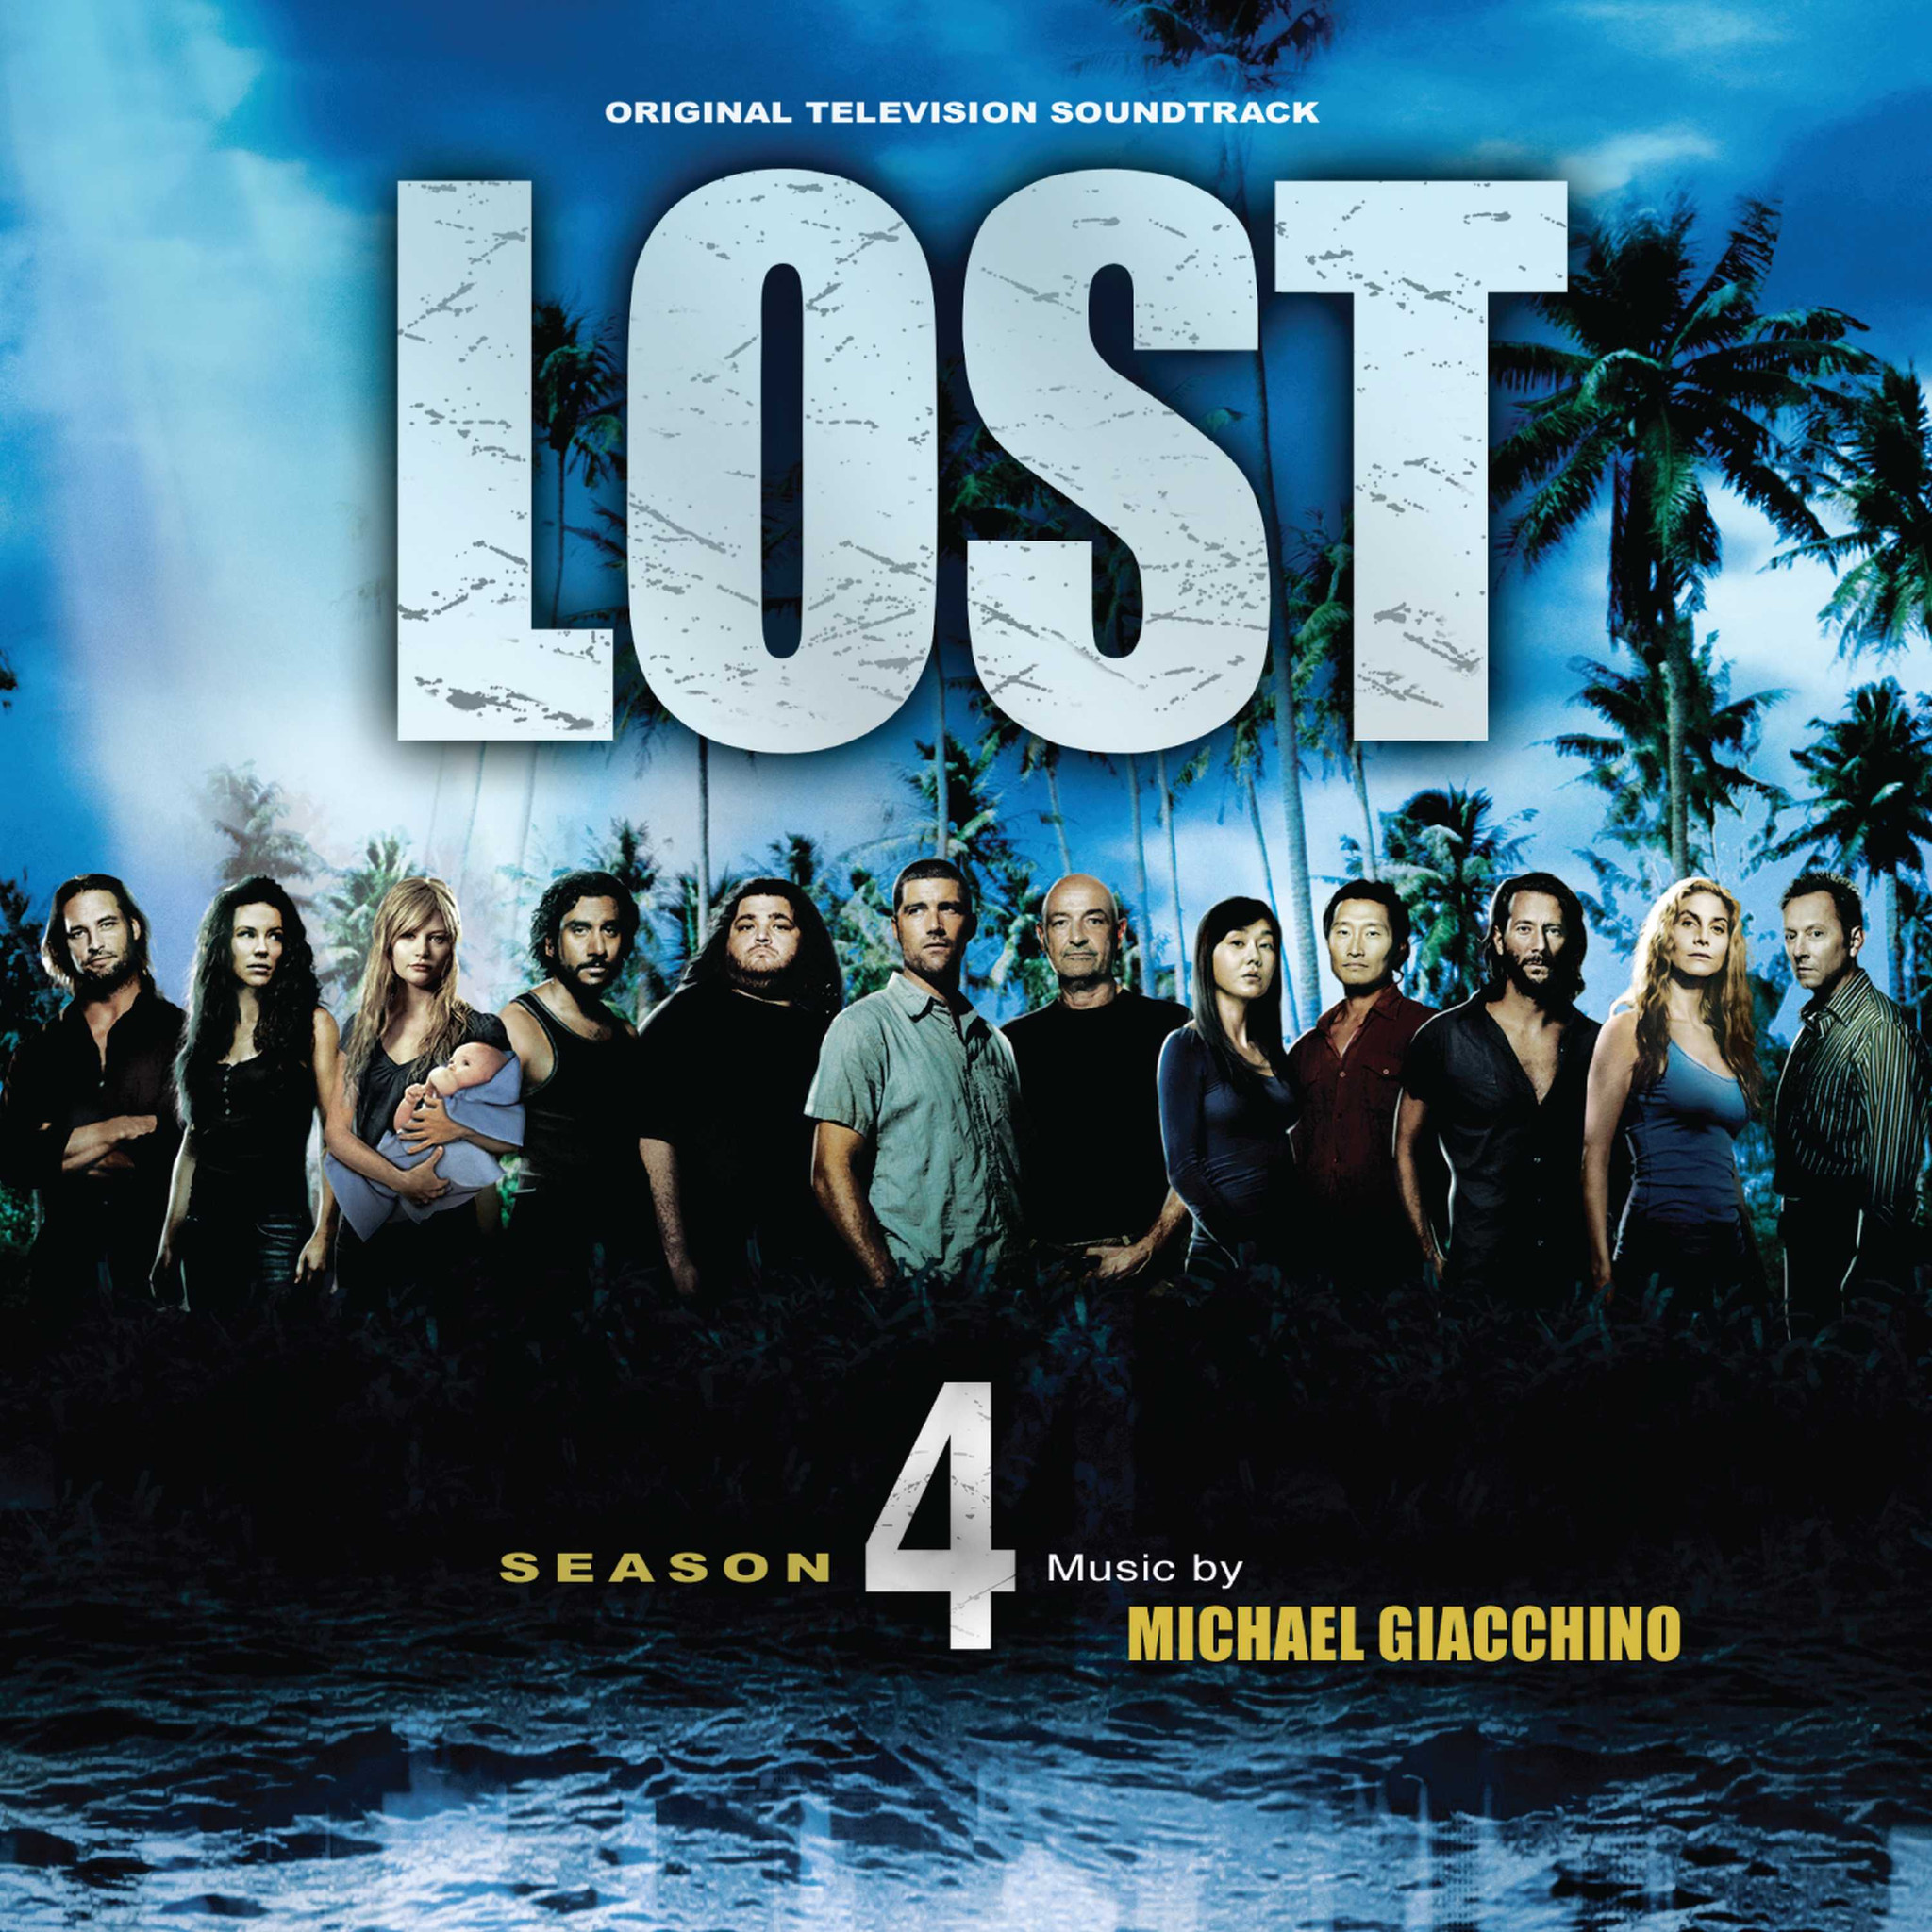 Lost: Season 4 (Score) / O.s.t. - Lost: Season 4 (Score) / O.s.t. - Musik - SOUNDTRACK - 0030206696424 - May 12, 2009